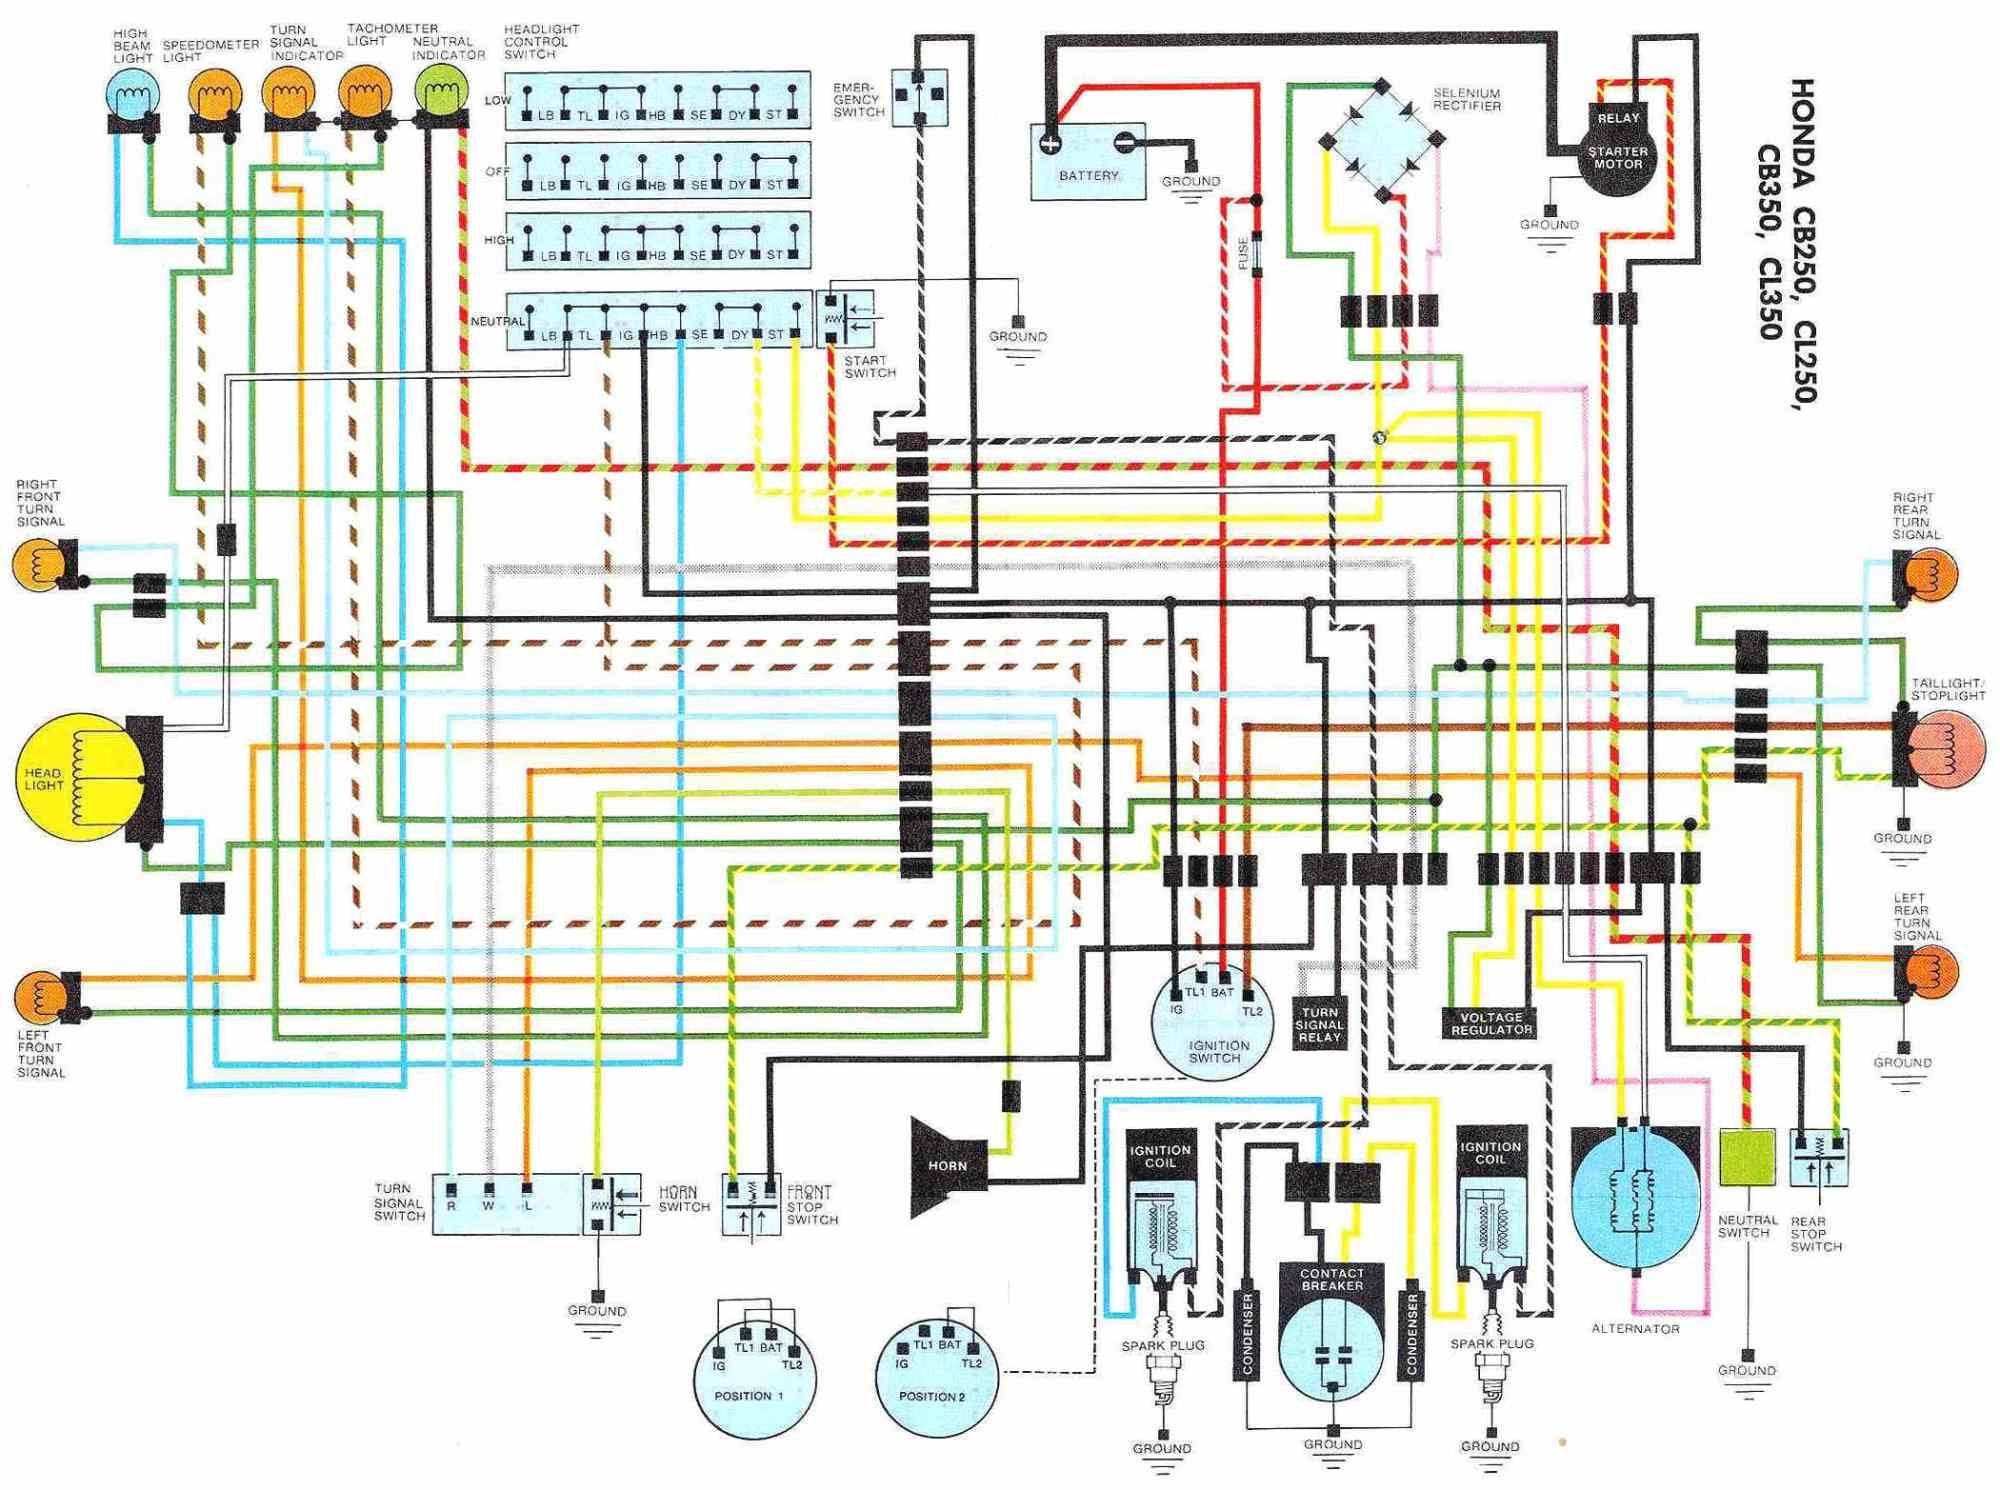 hight resolution of cb50 wiring diagram wiring diagram detailed smart car diagrams cb350 stator wiring diagram wiring diagram for